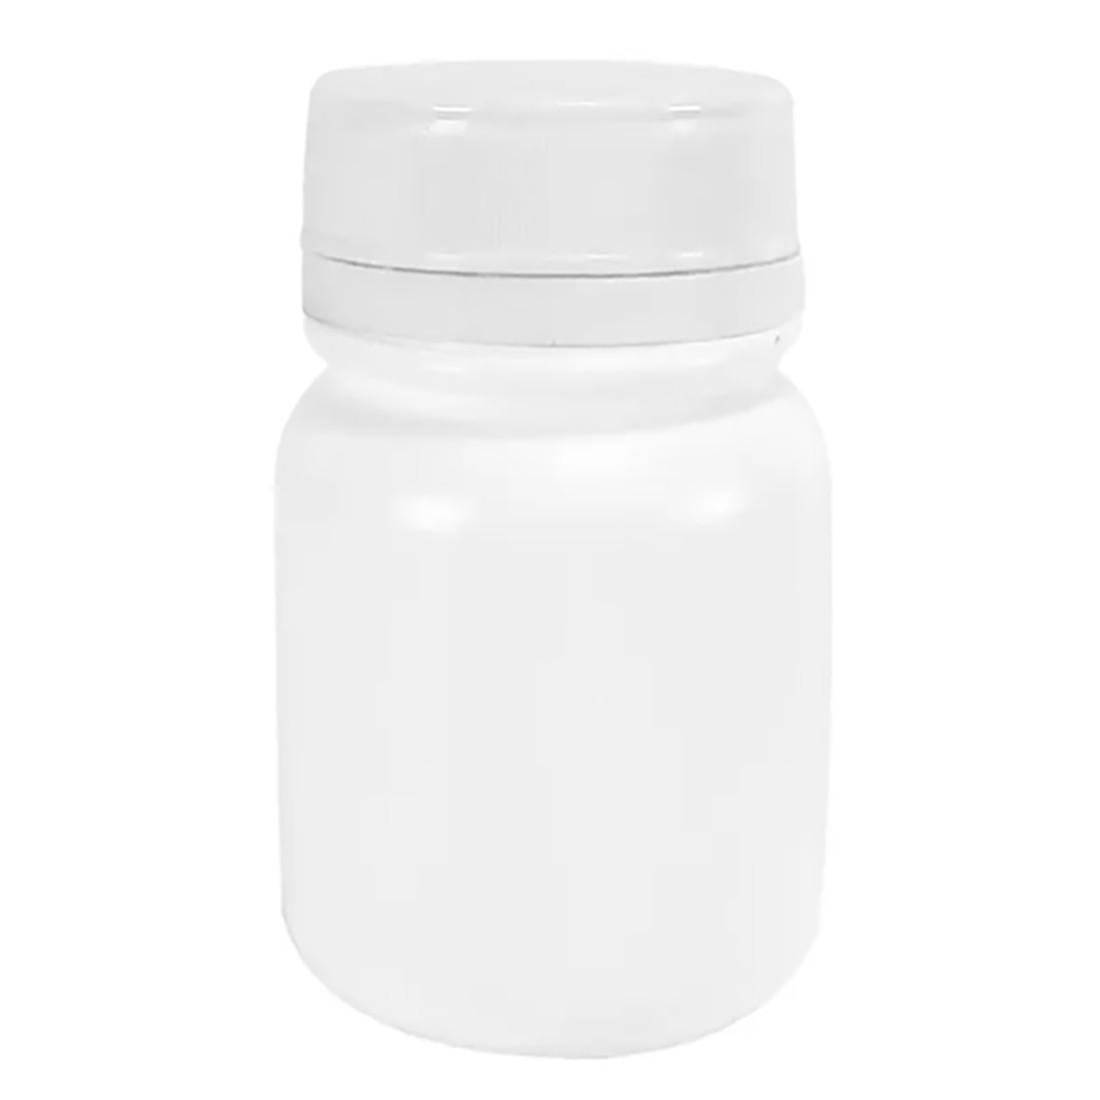 Pote Plástico para cápsula 120 ml Rosca Lacre kit com 200 unid